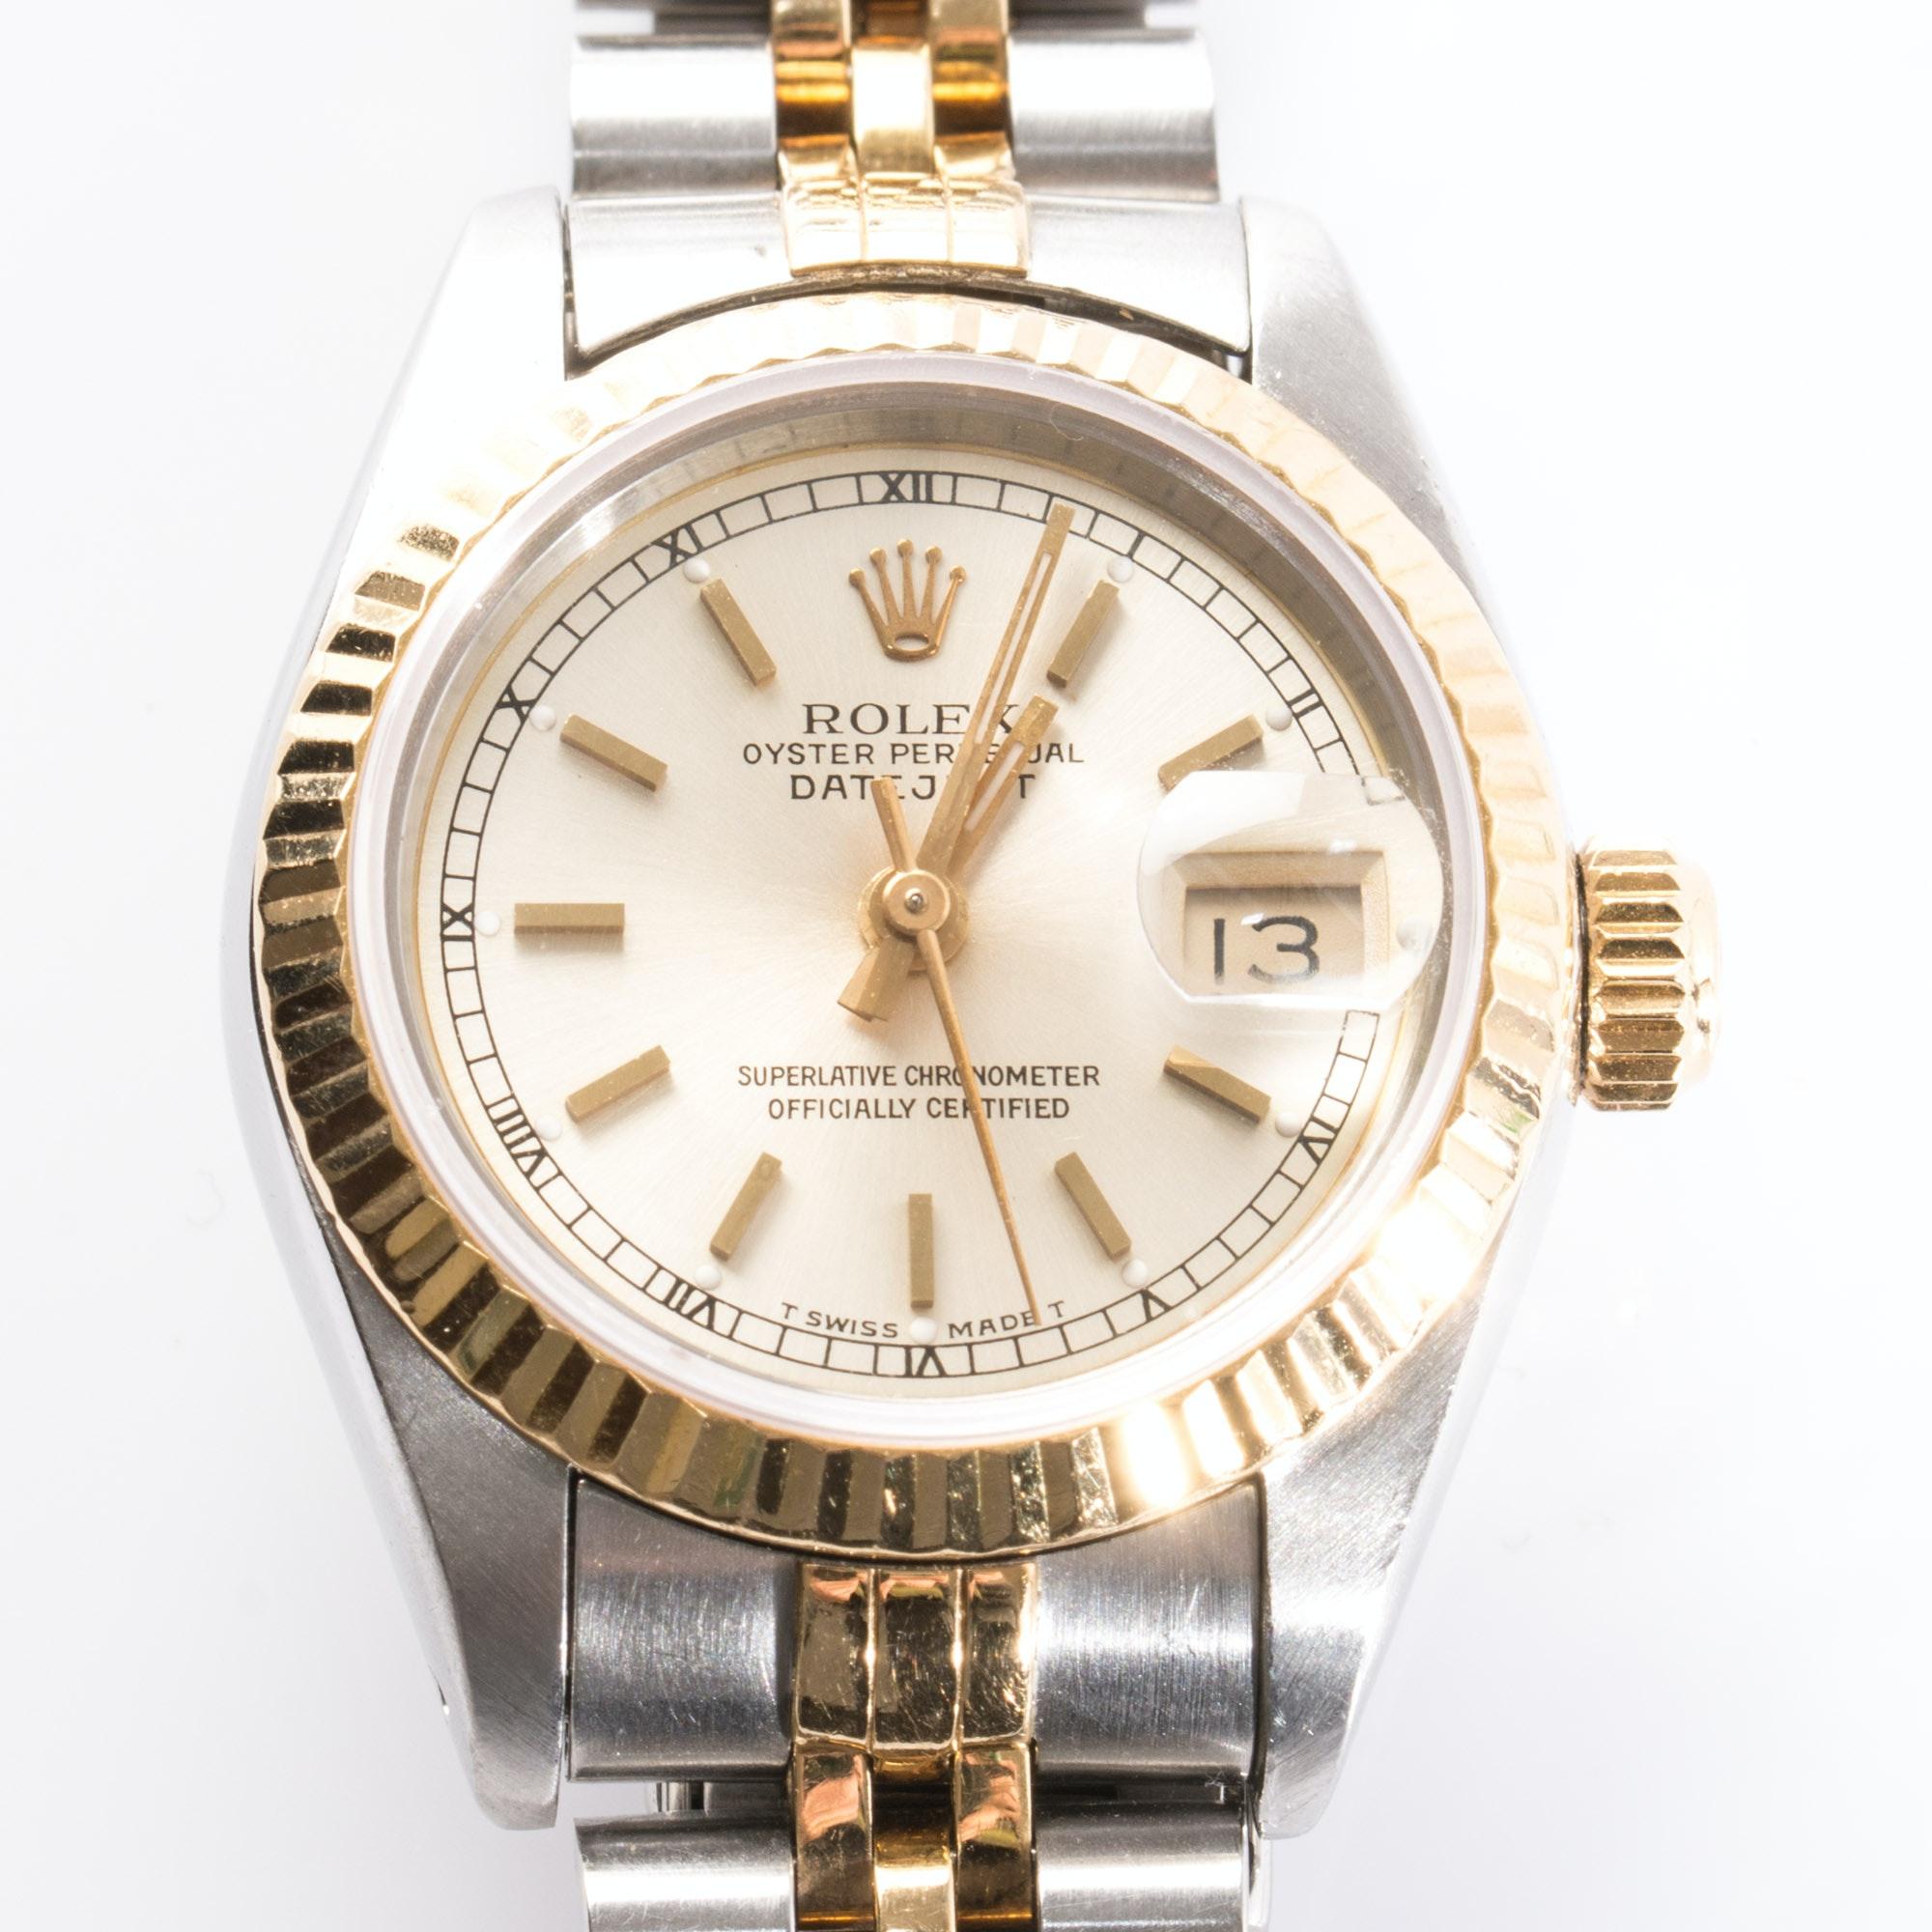 Women's 18K Rolex Oyster Perpetual Datejust Wristwatch